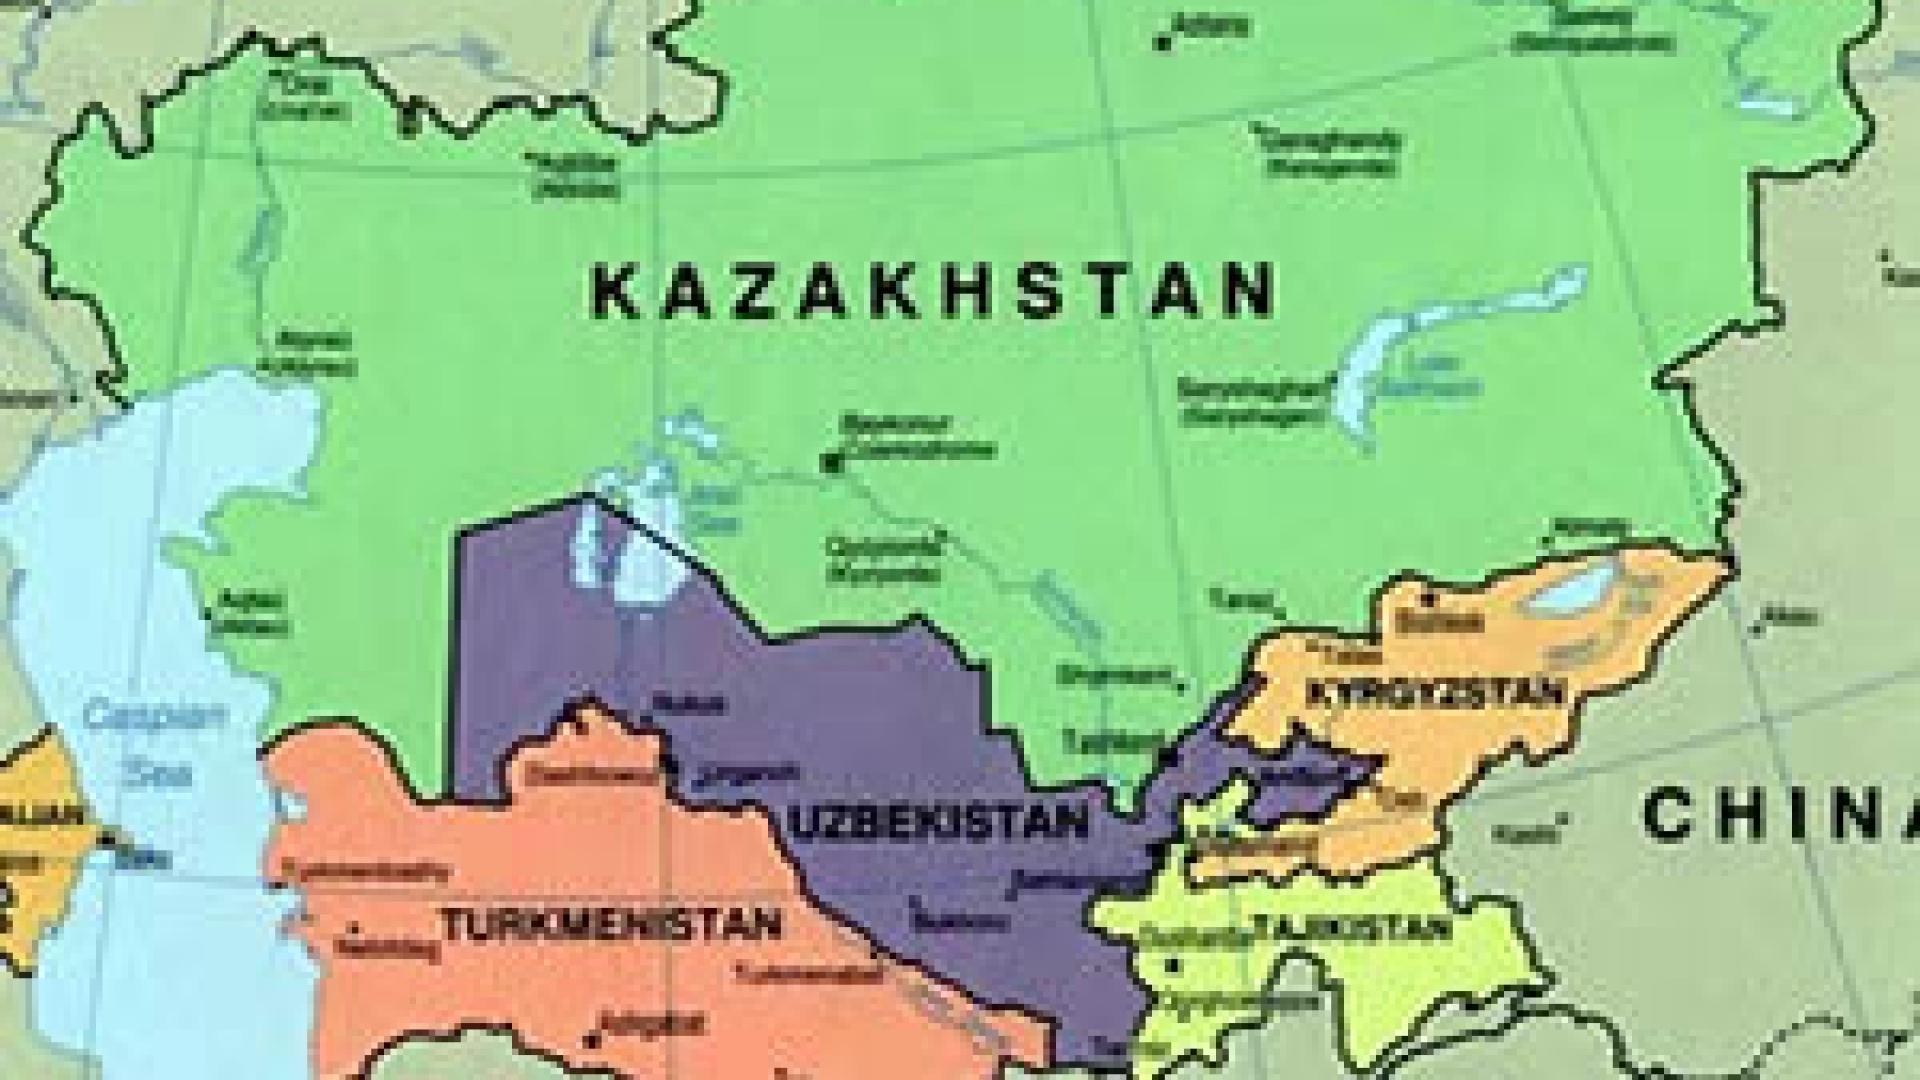 Central Asia: Towards a Nuclear-Free World | IAEA